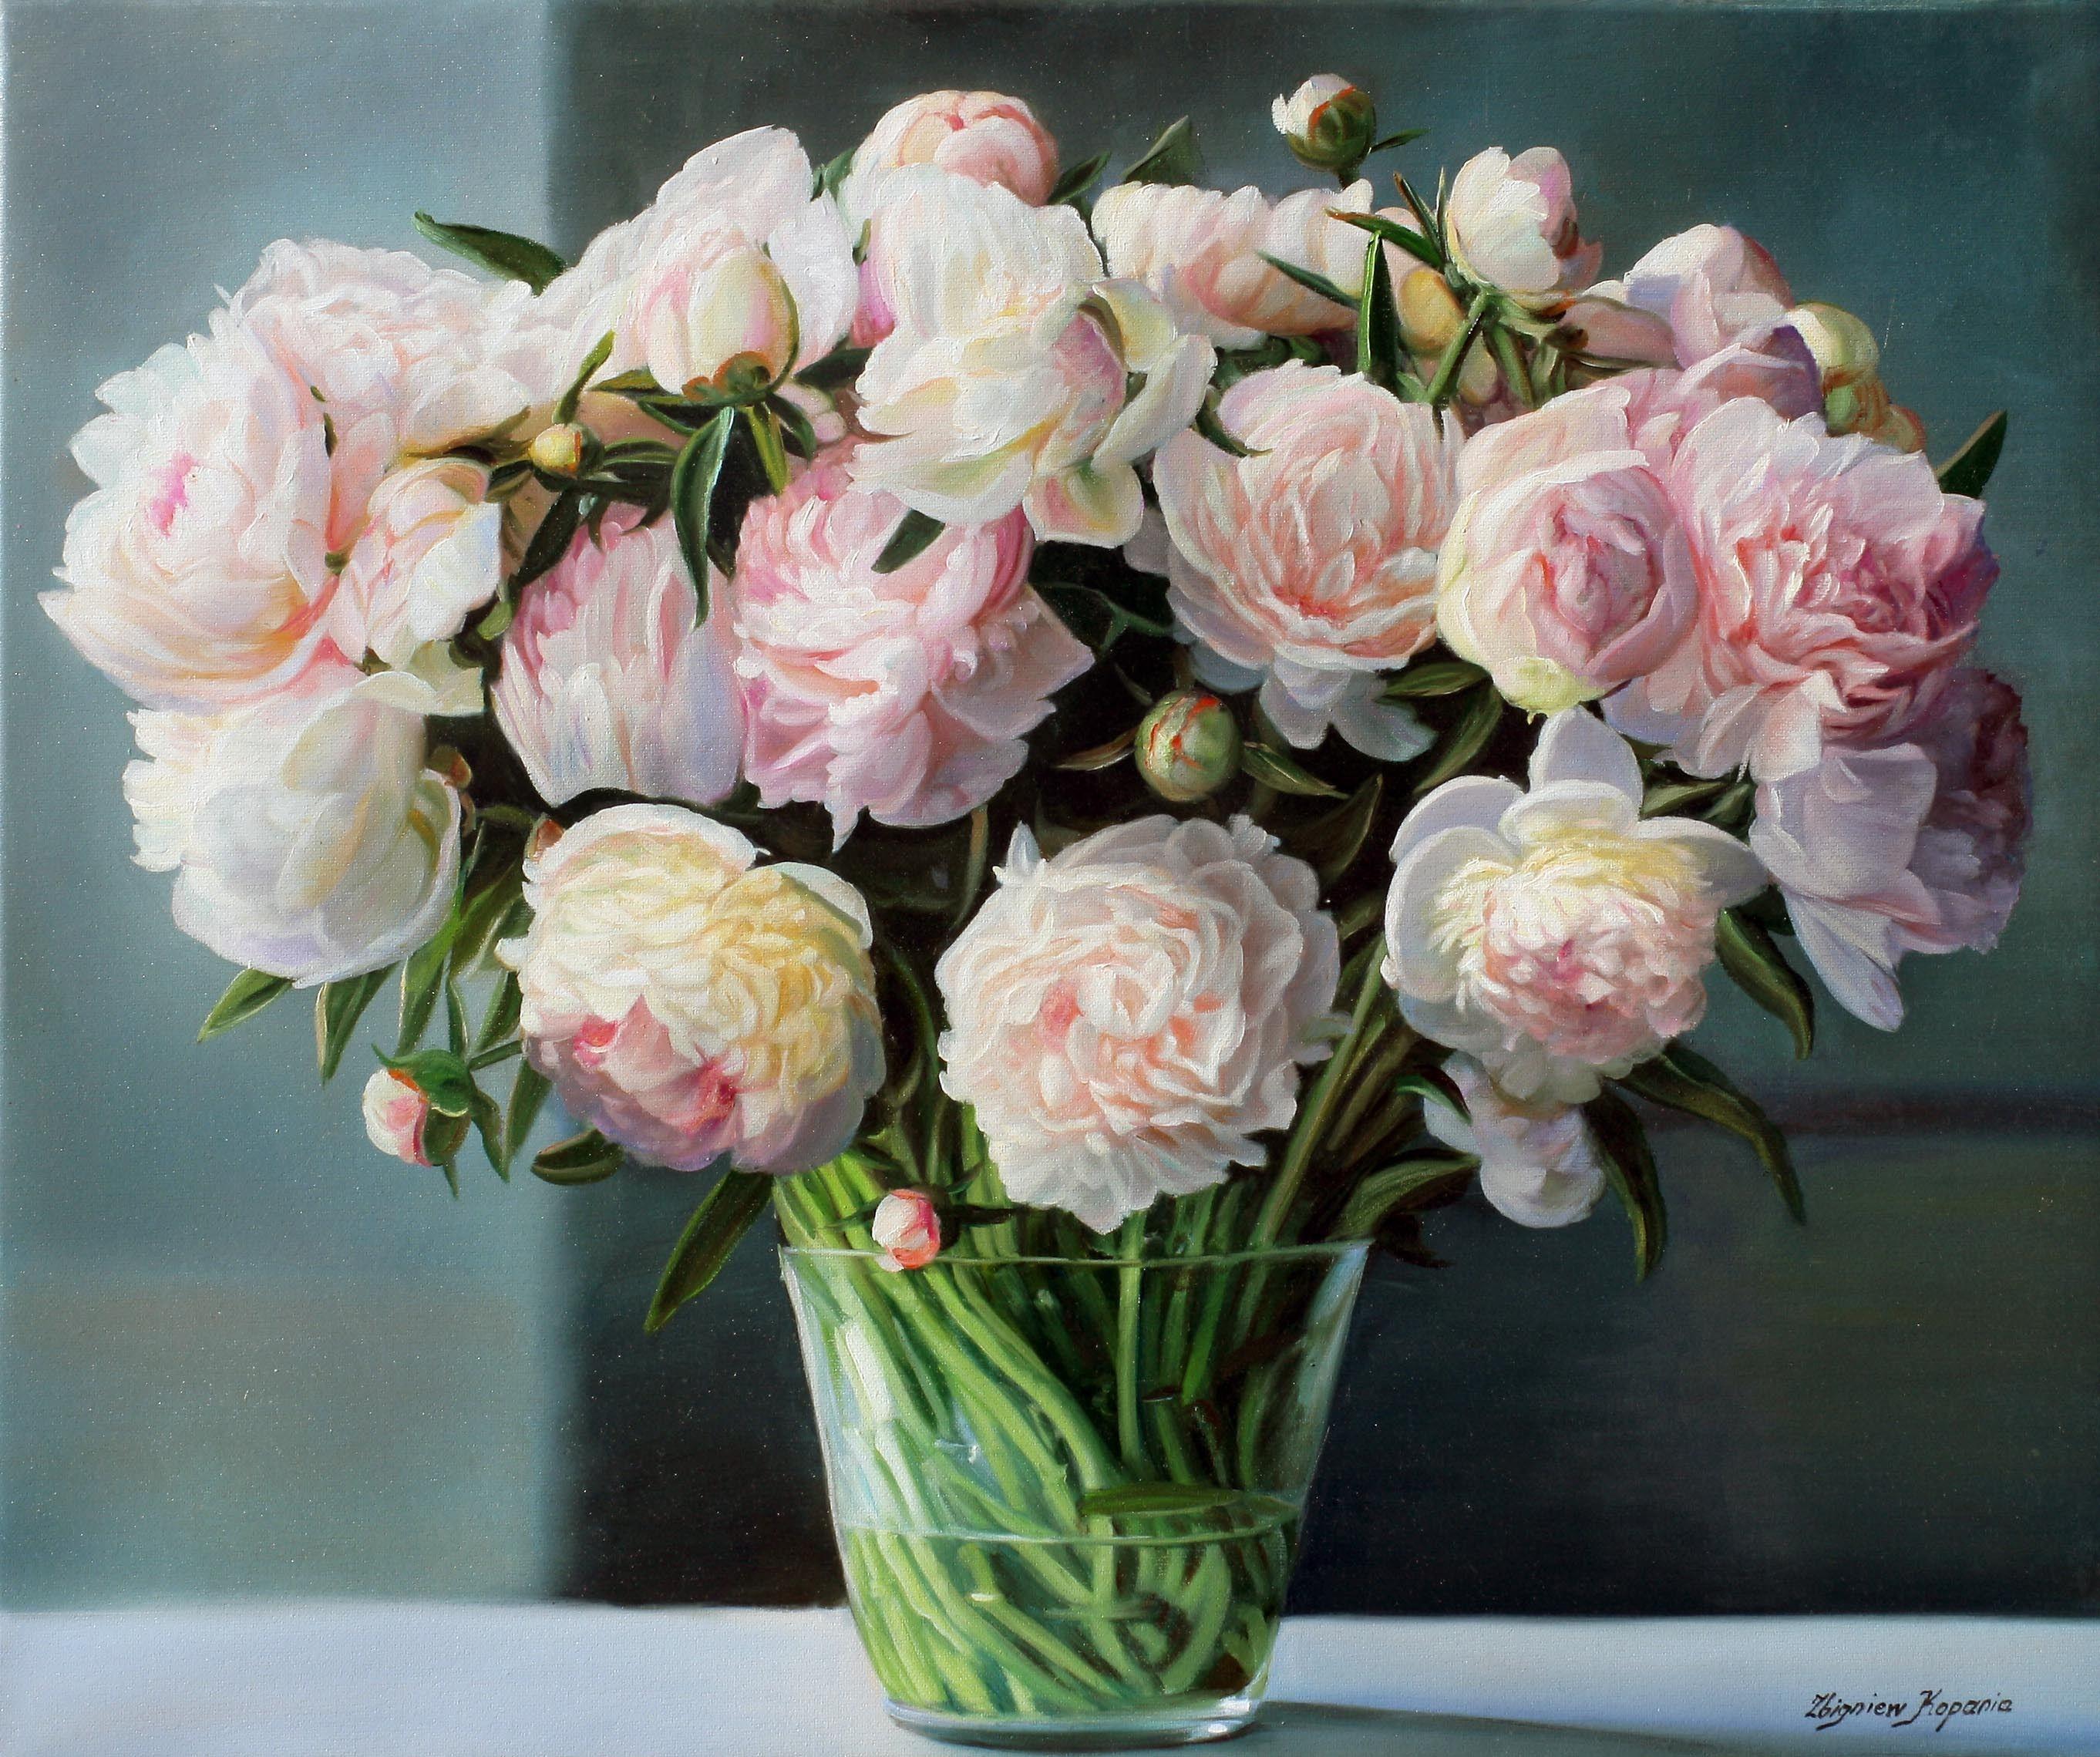 Picture zbigniew kopania still life flower peony rose vase stems picture zbigniew kopania still life flower peony rose reviewsmspy